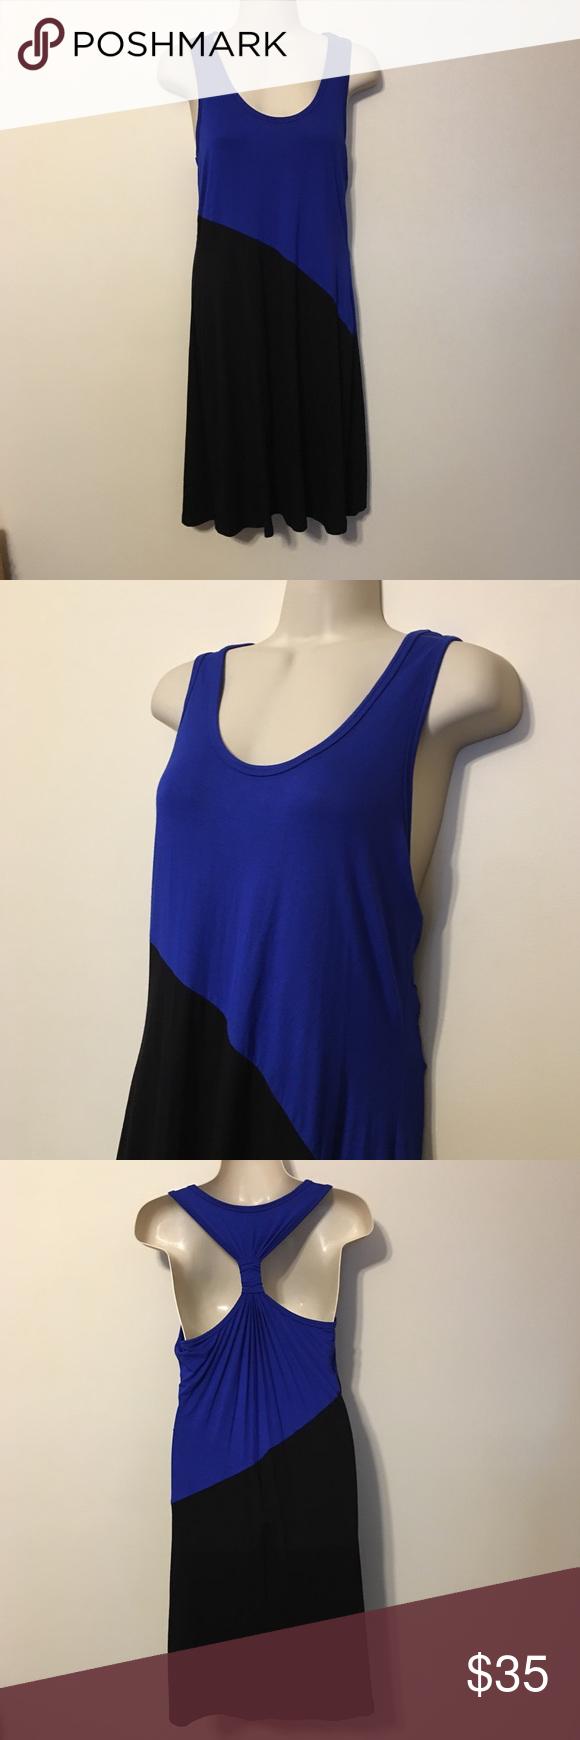 Calvin Klein Black & Blue Colorblock Dress Calvin Klein Black & Blue Colorblock Racerback Dress Calvin Klein Dresses Midi